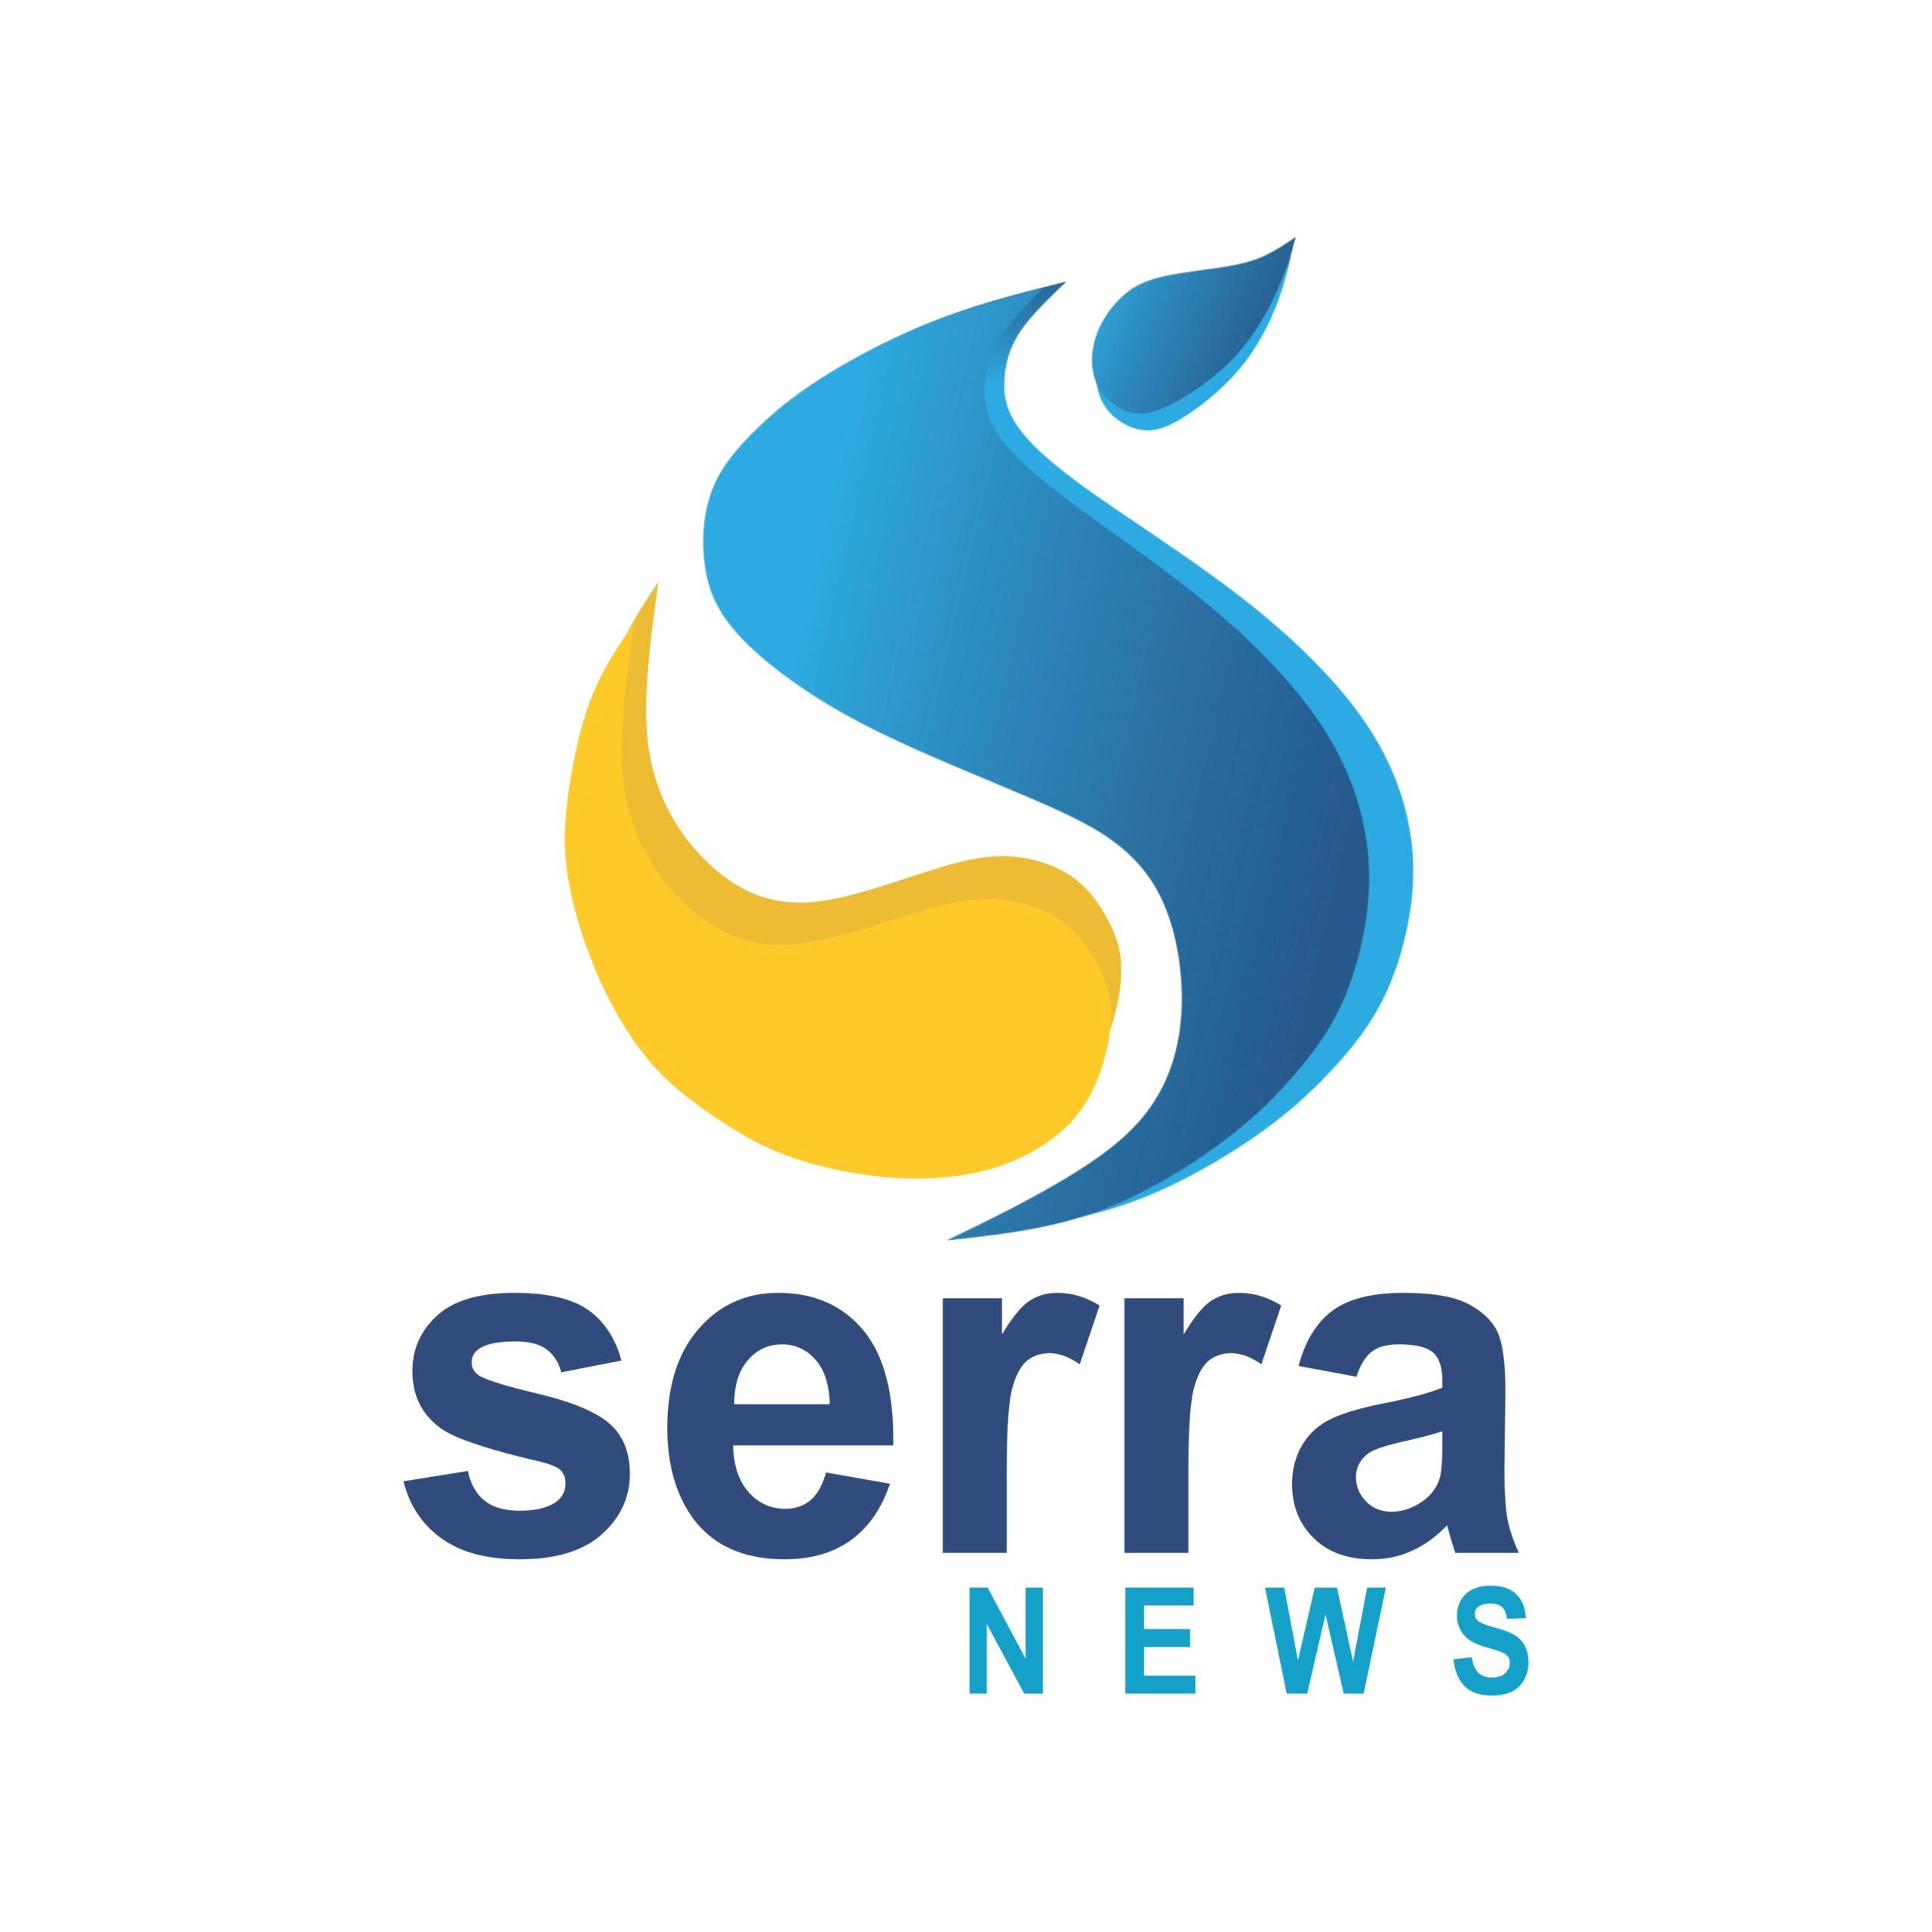 serra news